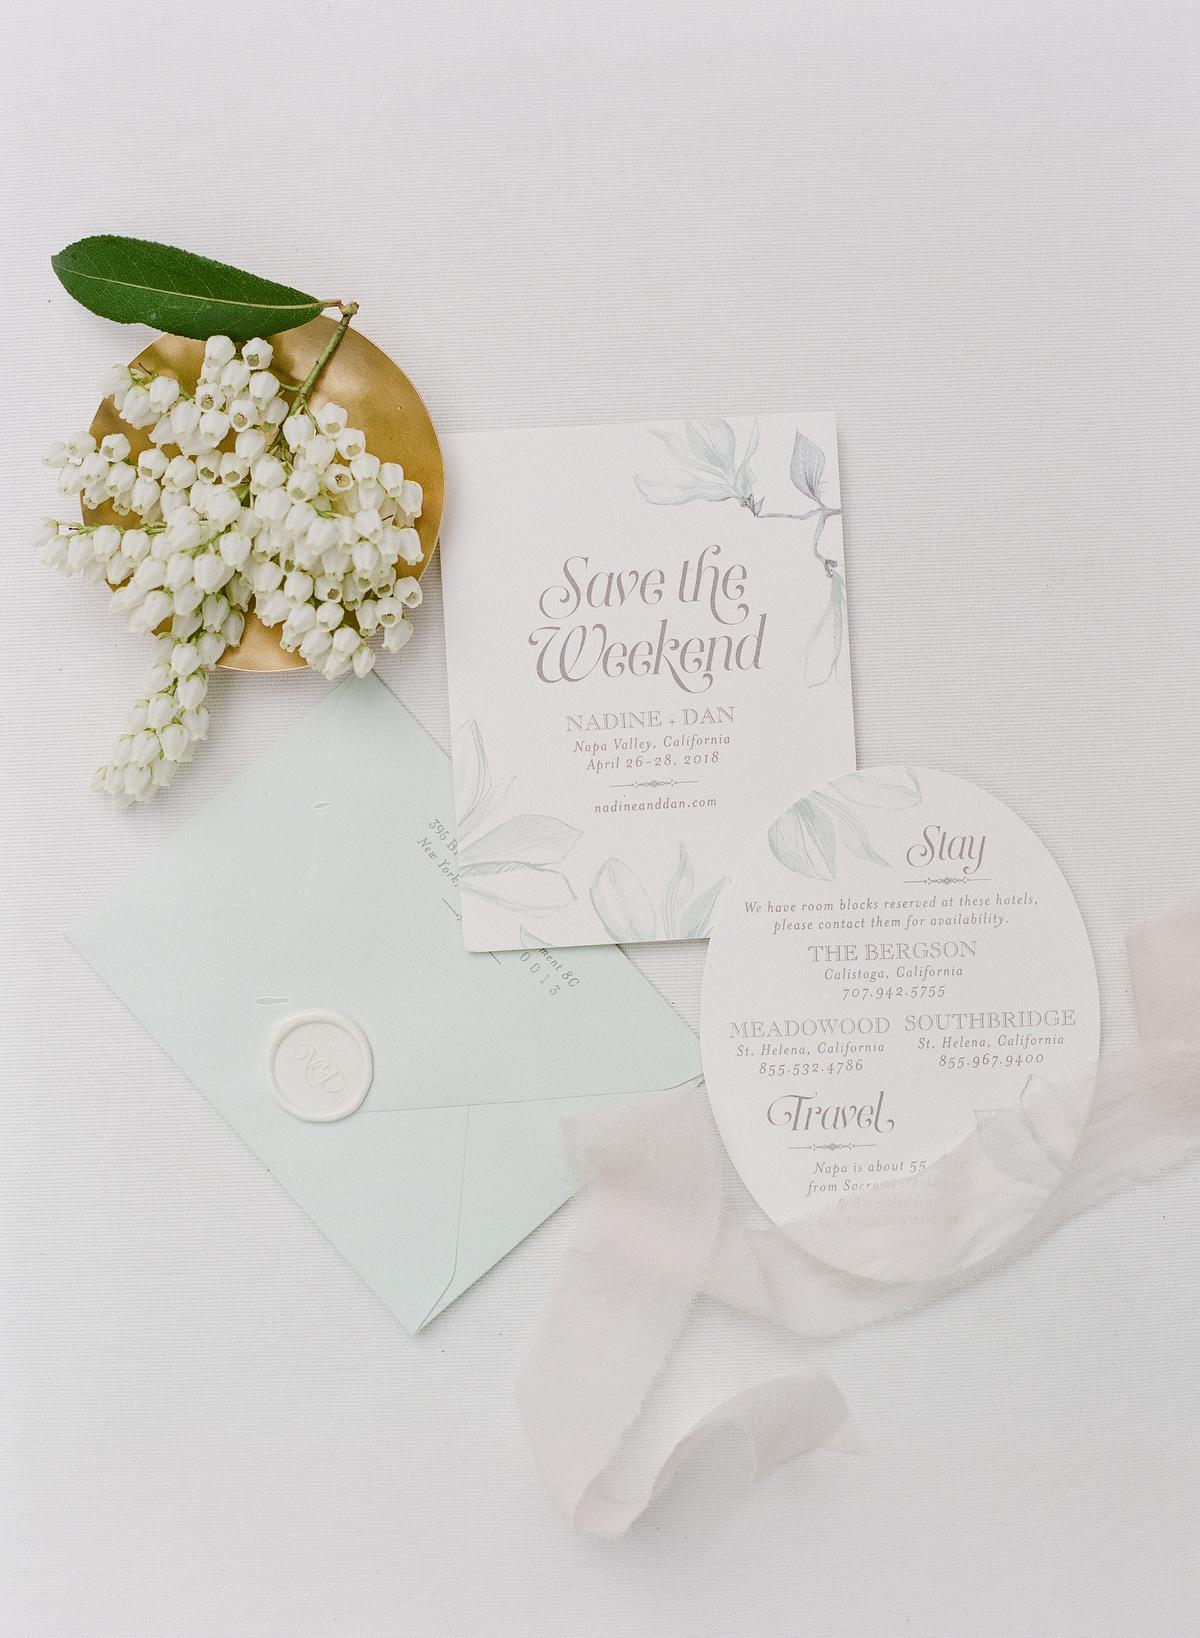 nadine dan wedding save the date